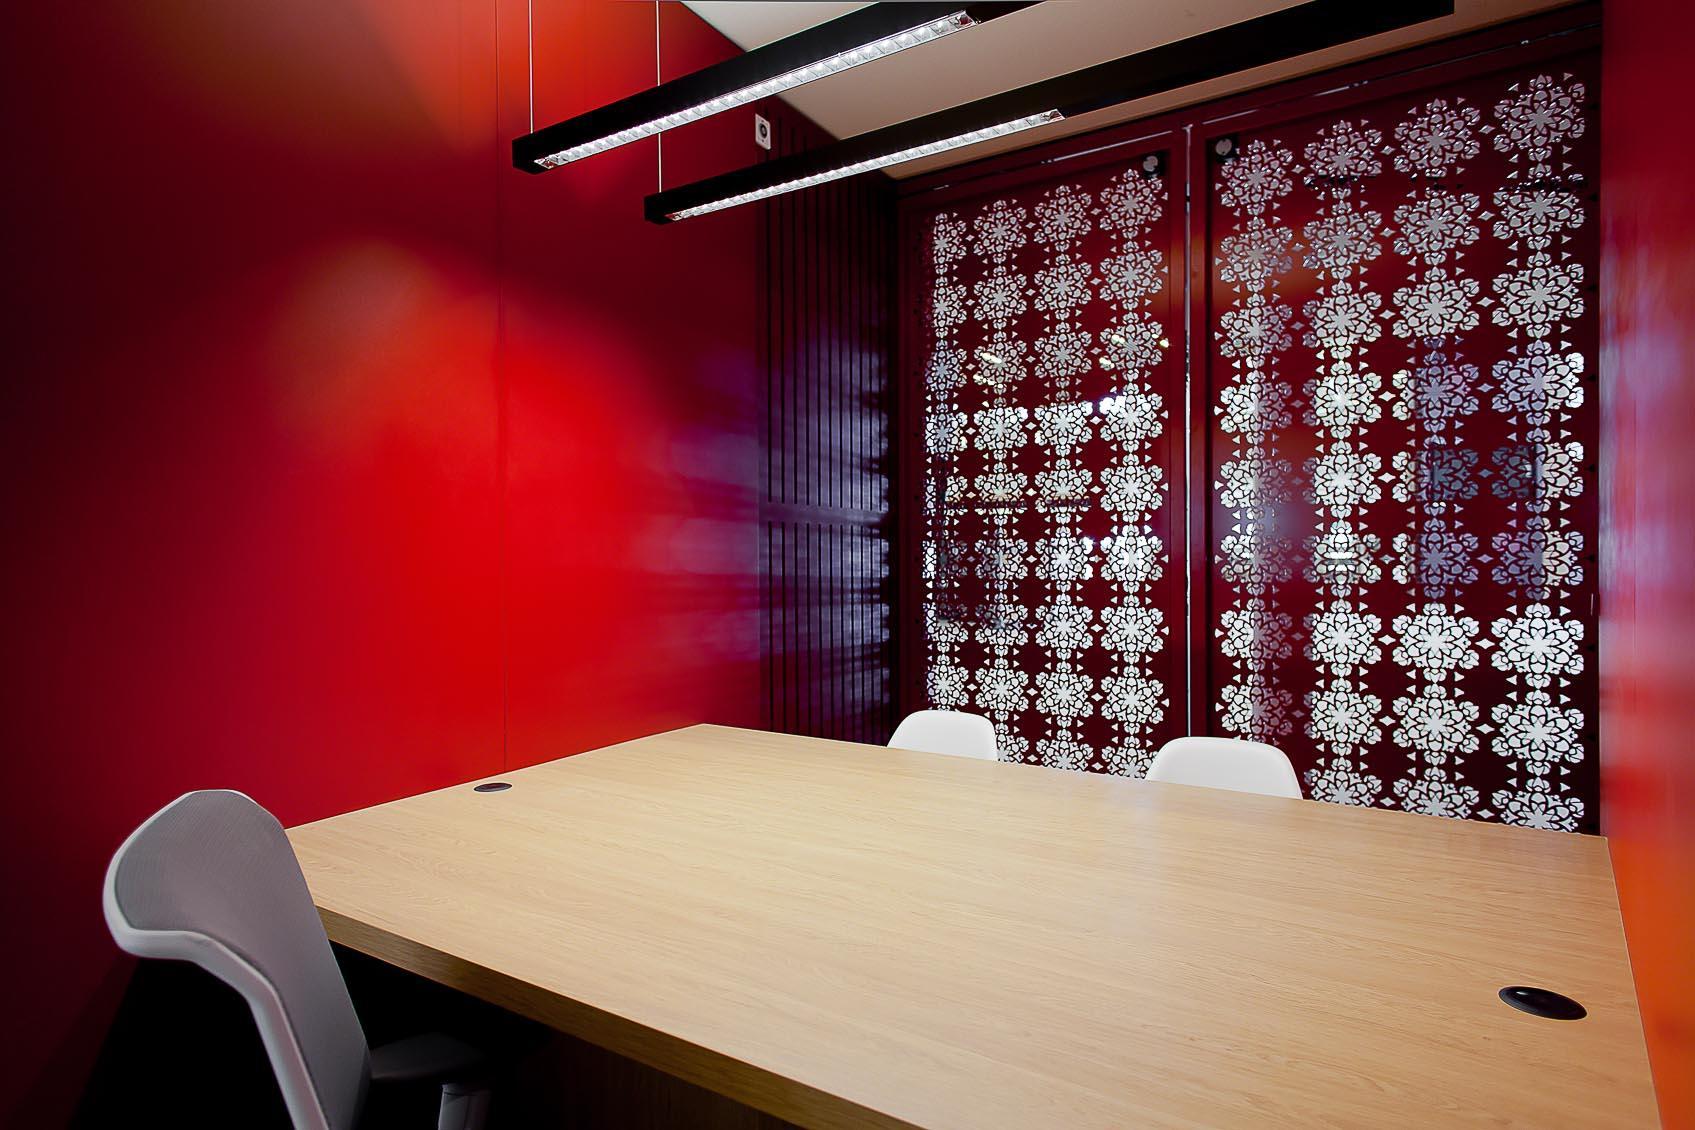 viabizzuno verlichting square system in besprekingsruimte nac belgië